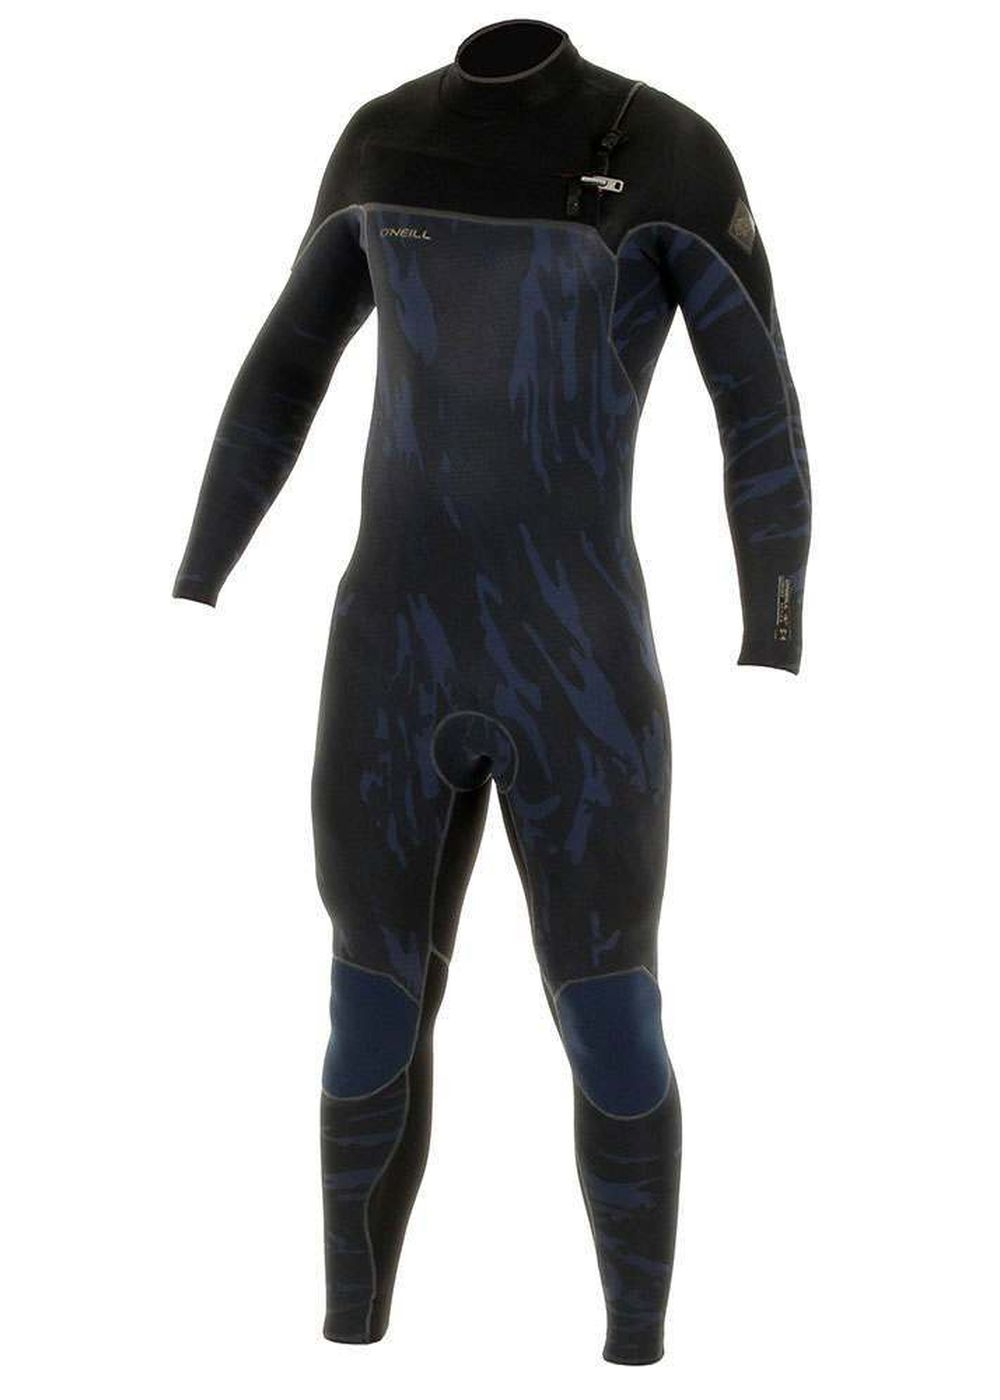 Oneill Freak Fz 5/4 Ssw Wetsuit 2017 Navy Camo Picture